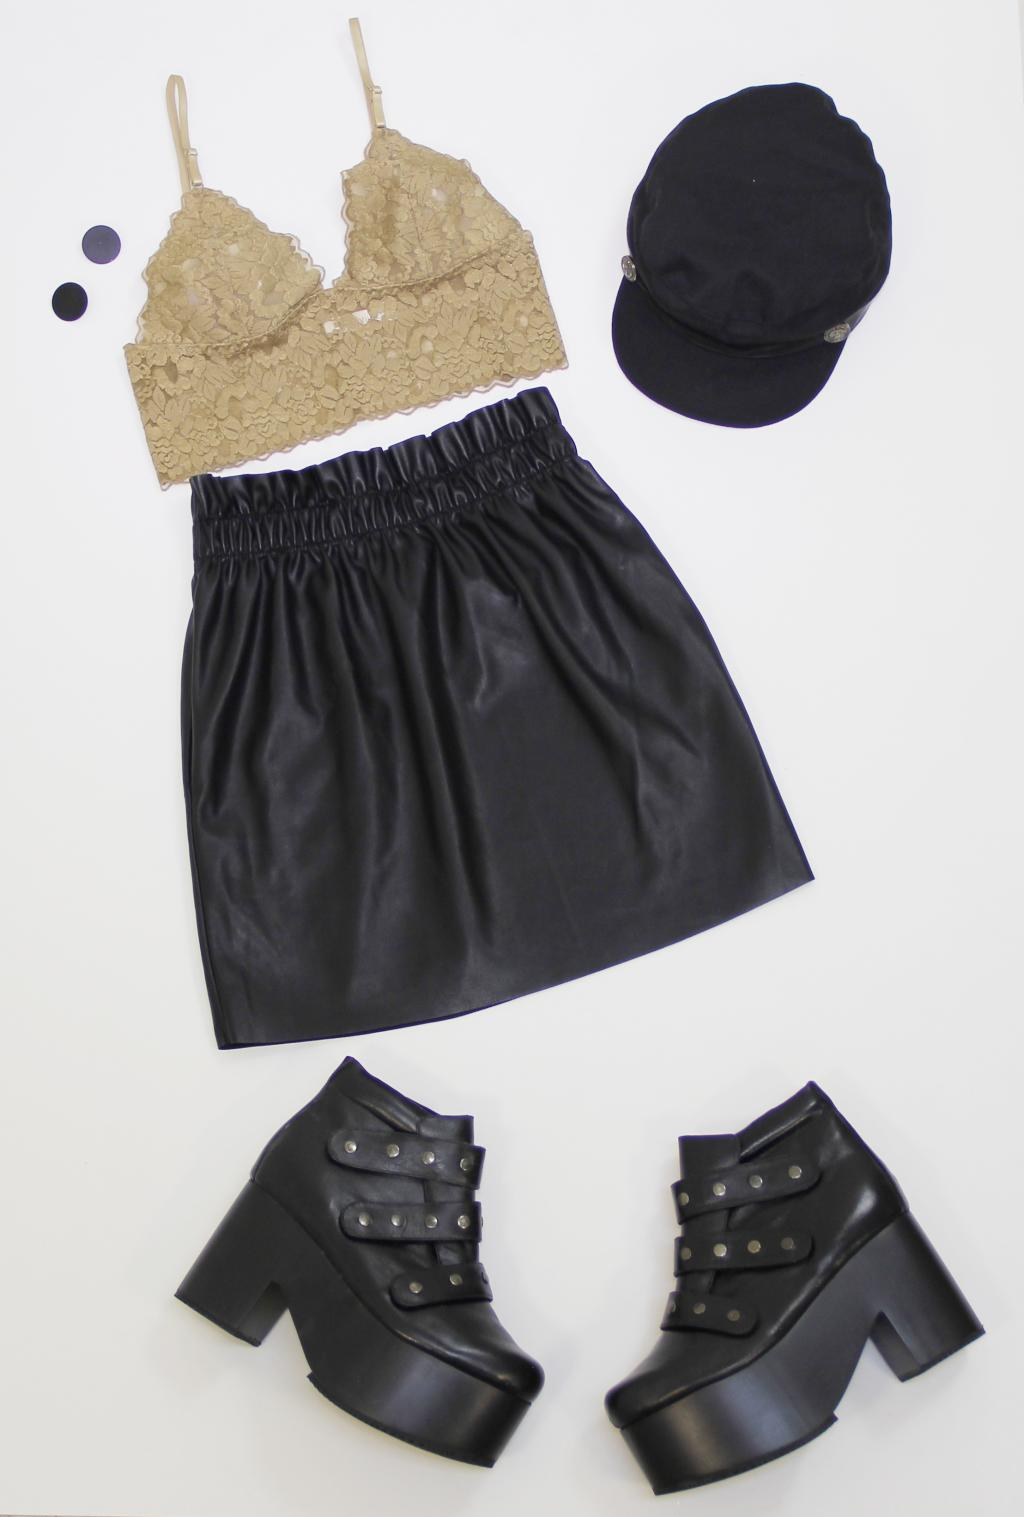 falda y bralette